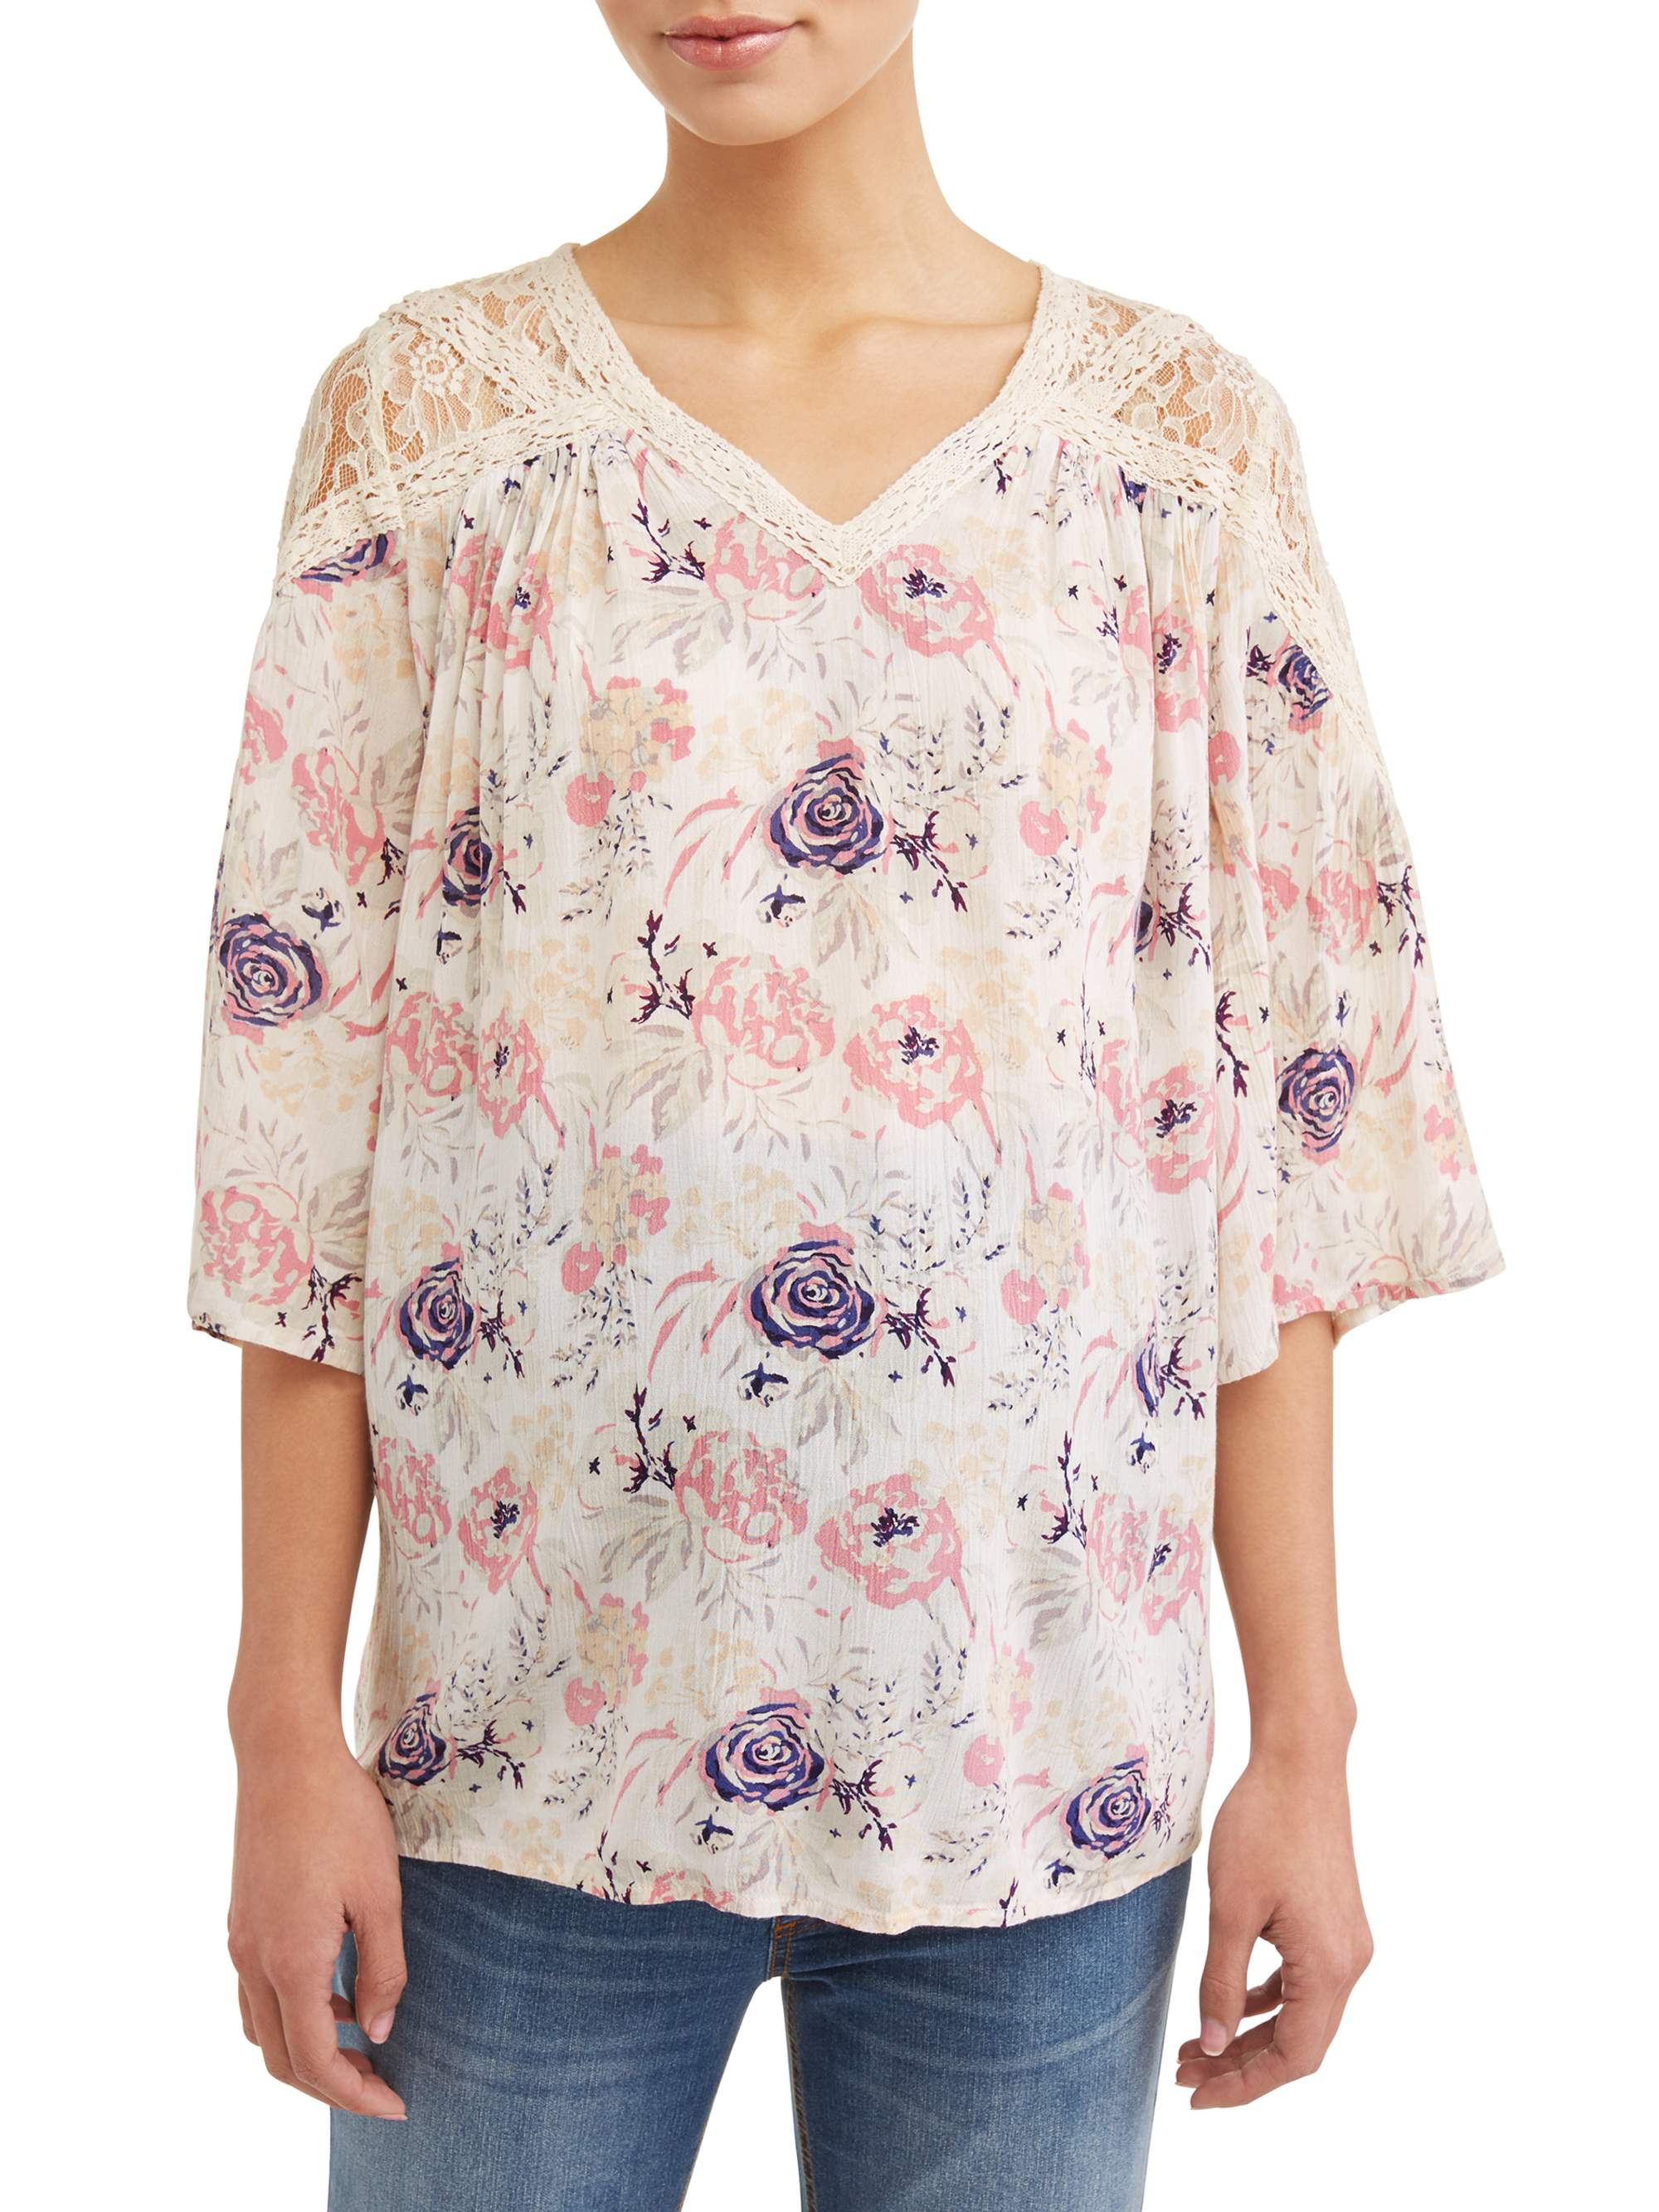 Maternity 3/4 Sleeve Boho Top W/Mesh & Crochet Details